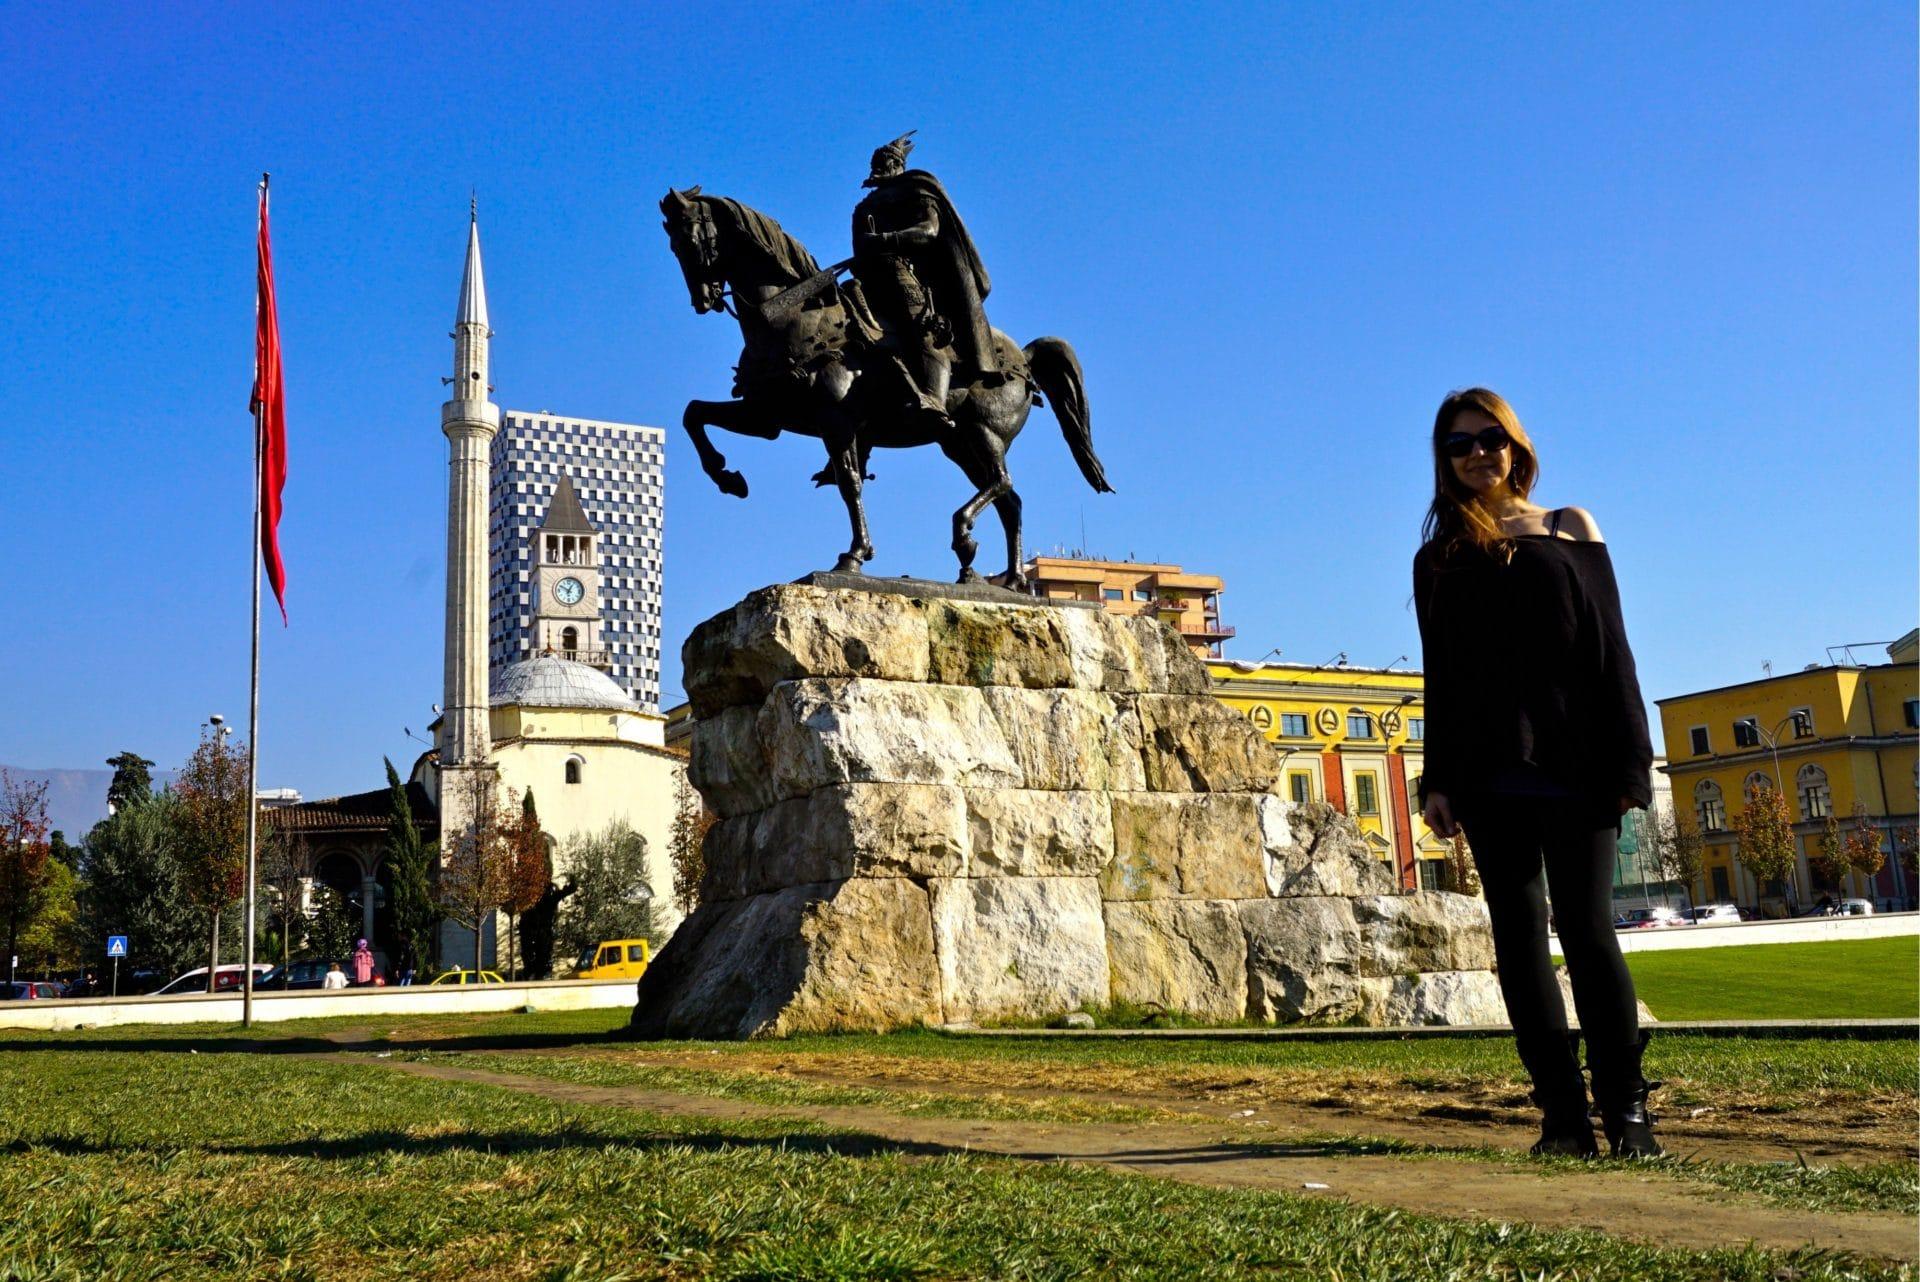 Skanderbeg square, Tirana, Albania - Experiencing the Globe